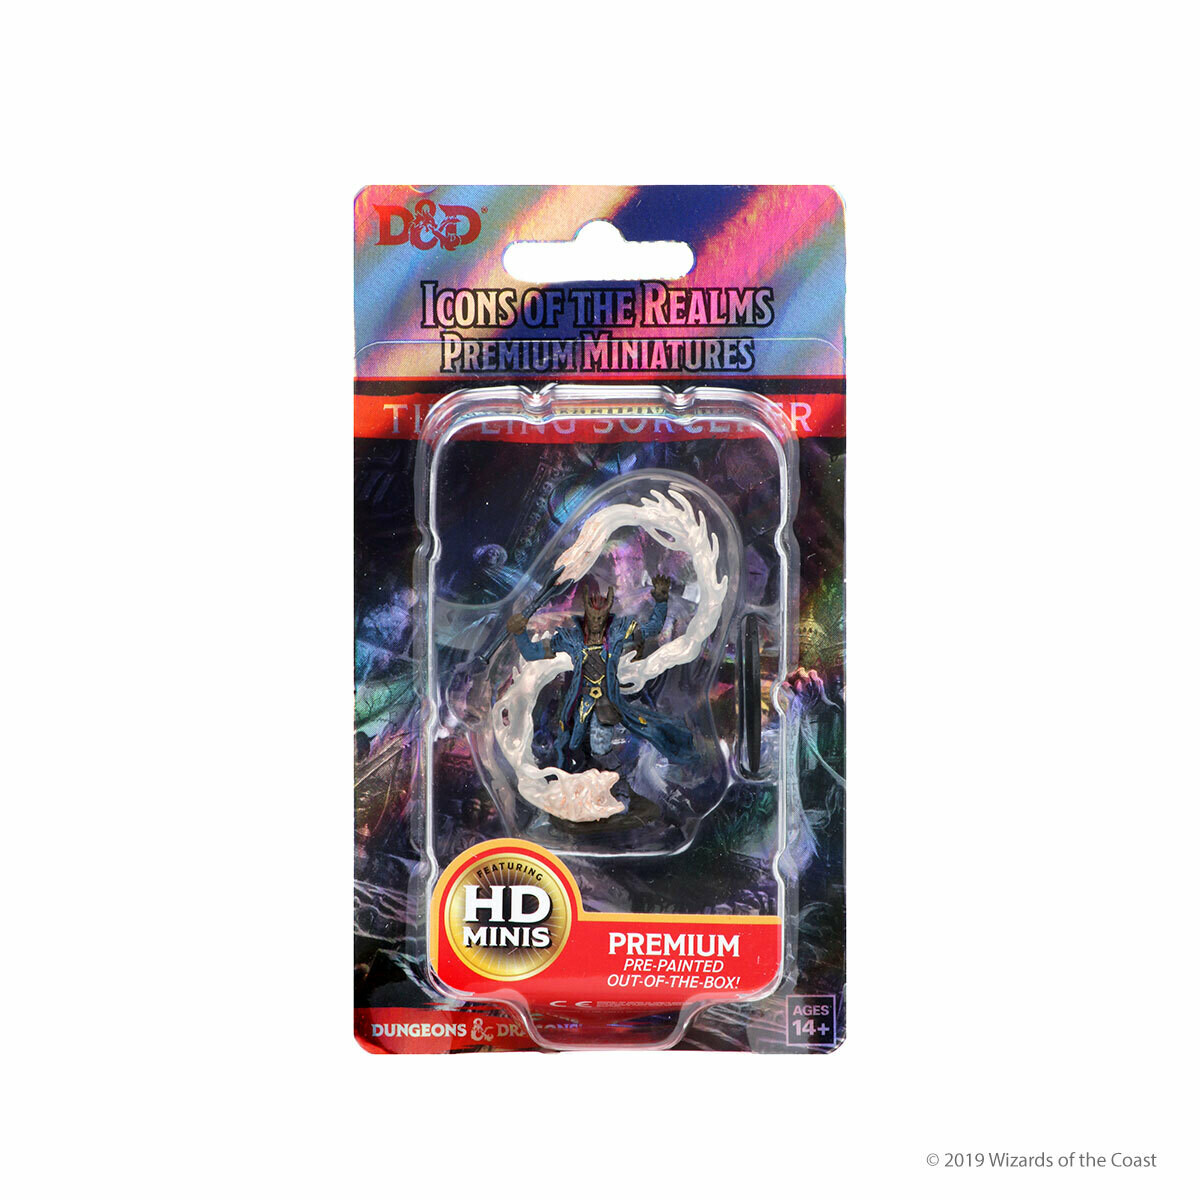 D&D Nolzur's Premium Miniatures - Tiefling Male Sorcerer (1 Miniatura)